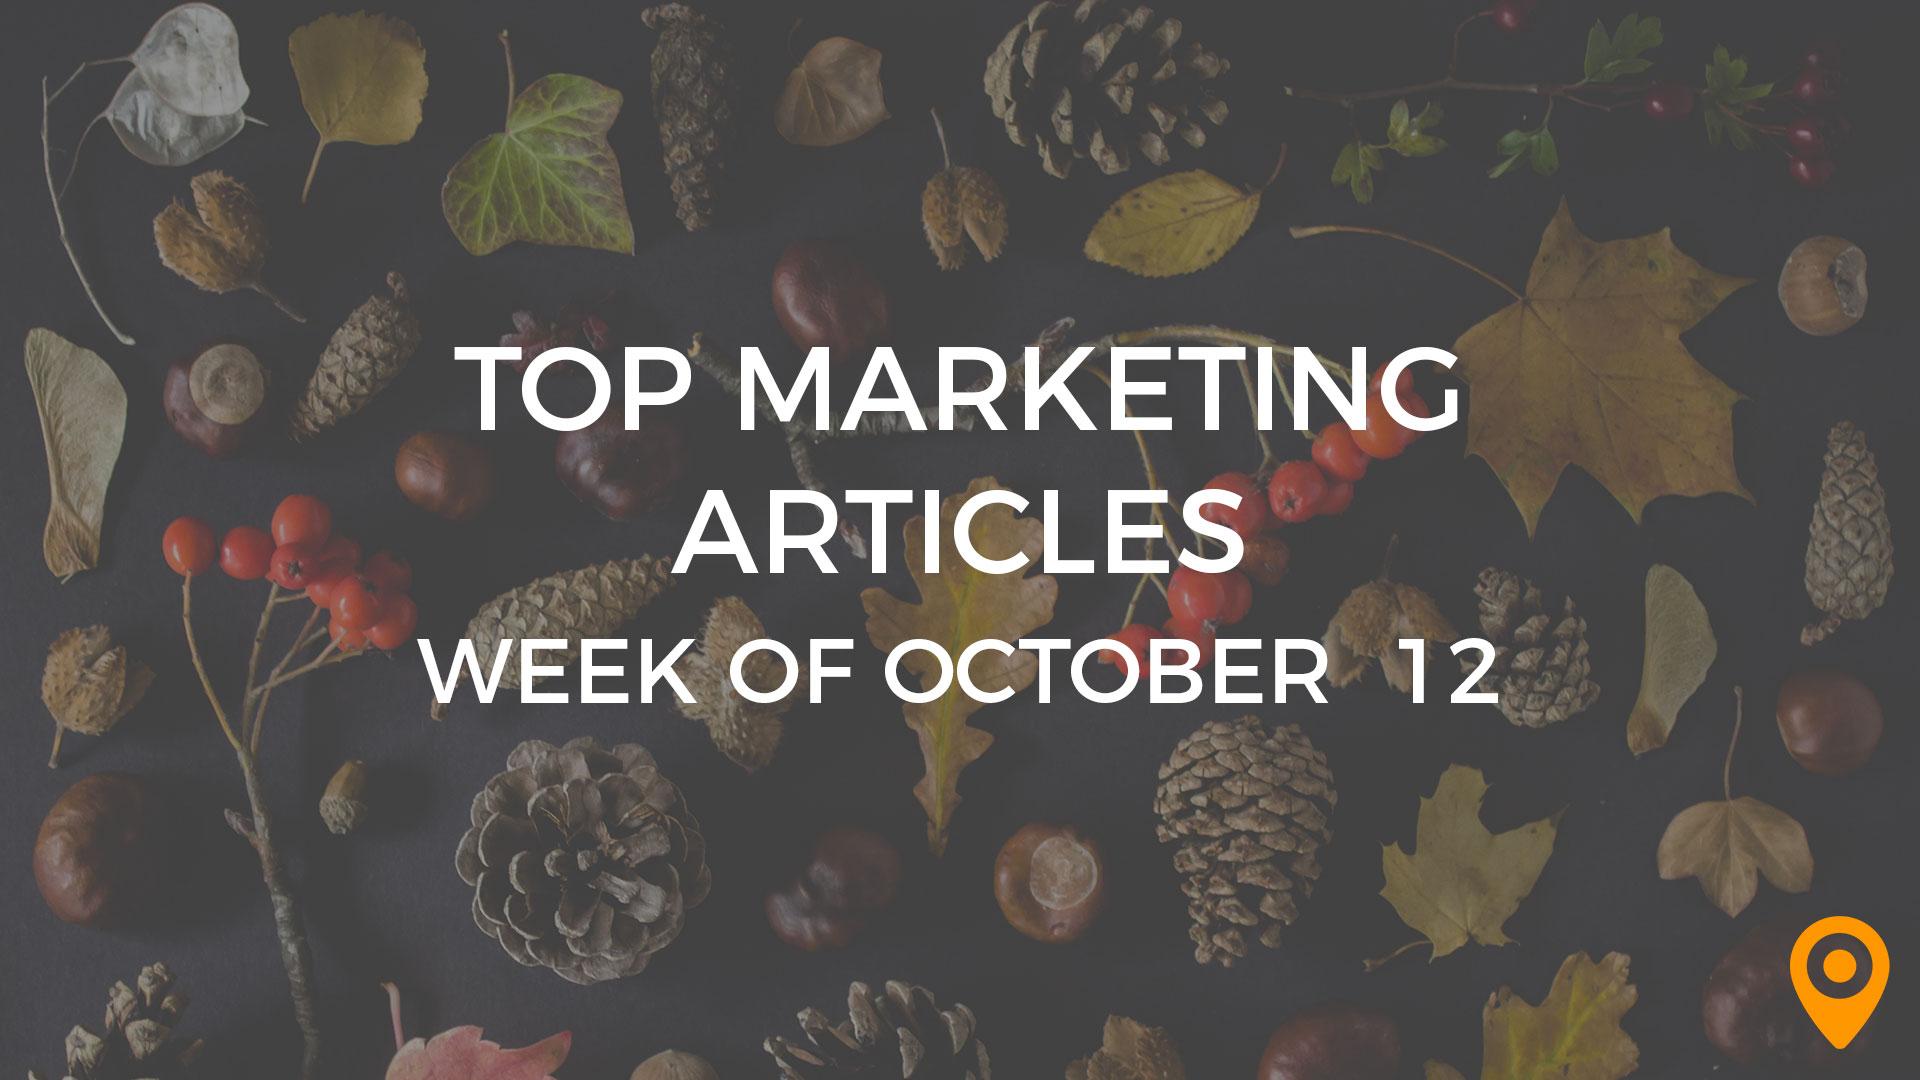 Top Marketing Articles Week of October 12